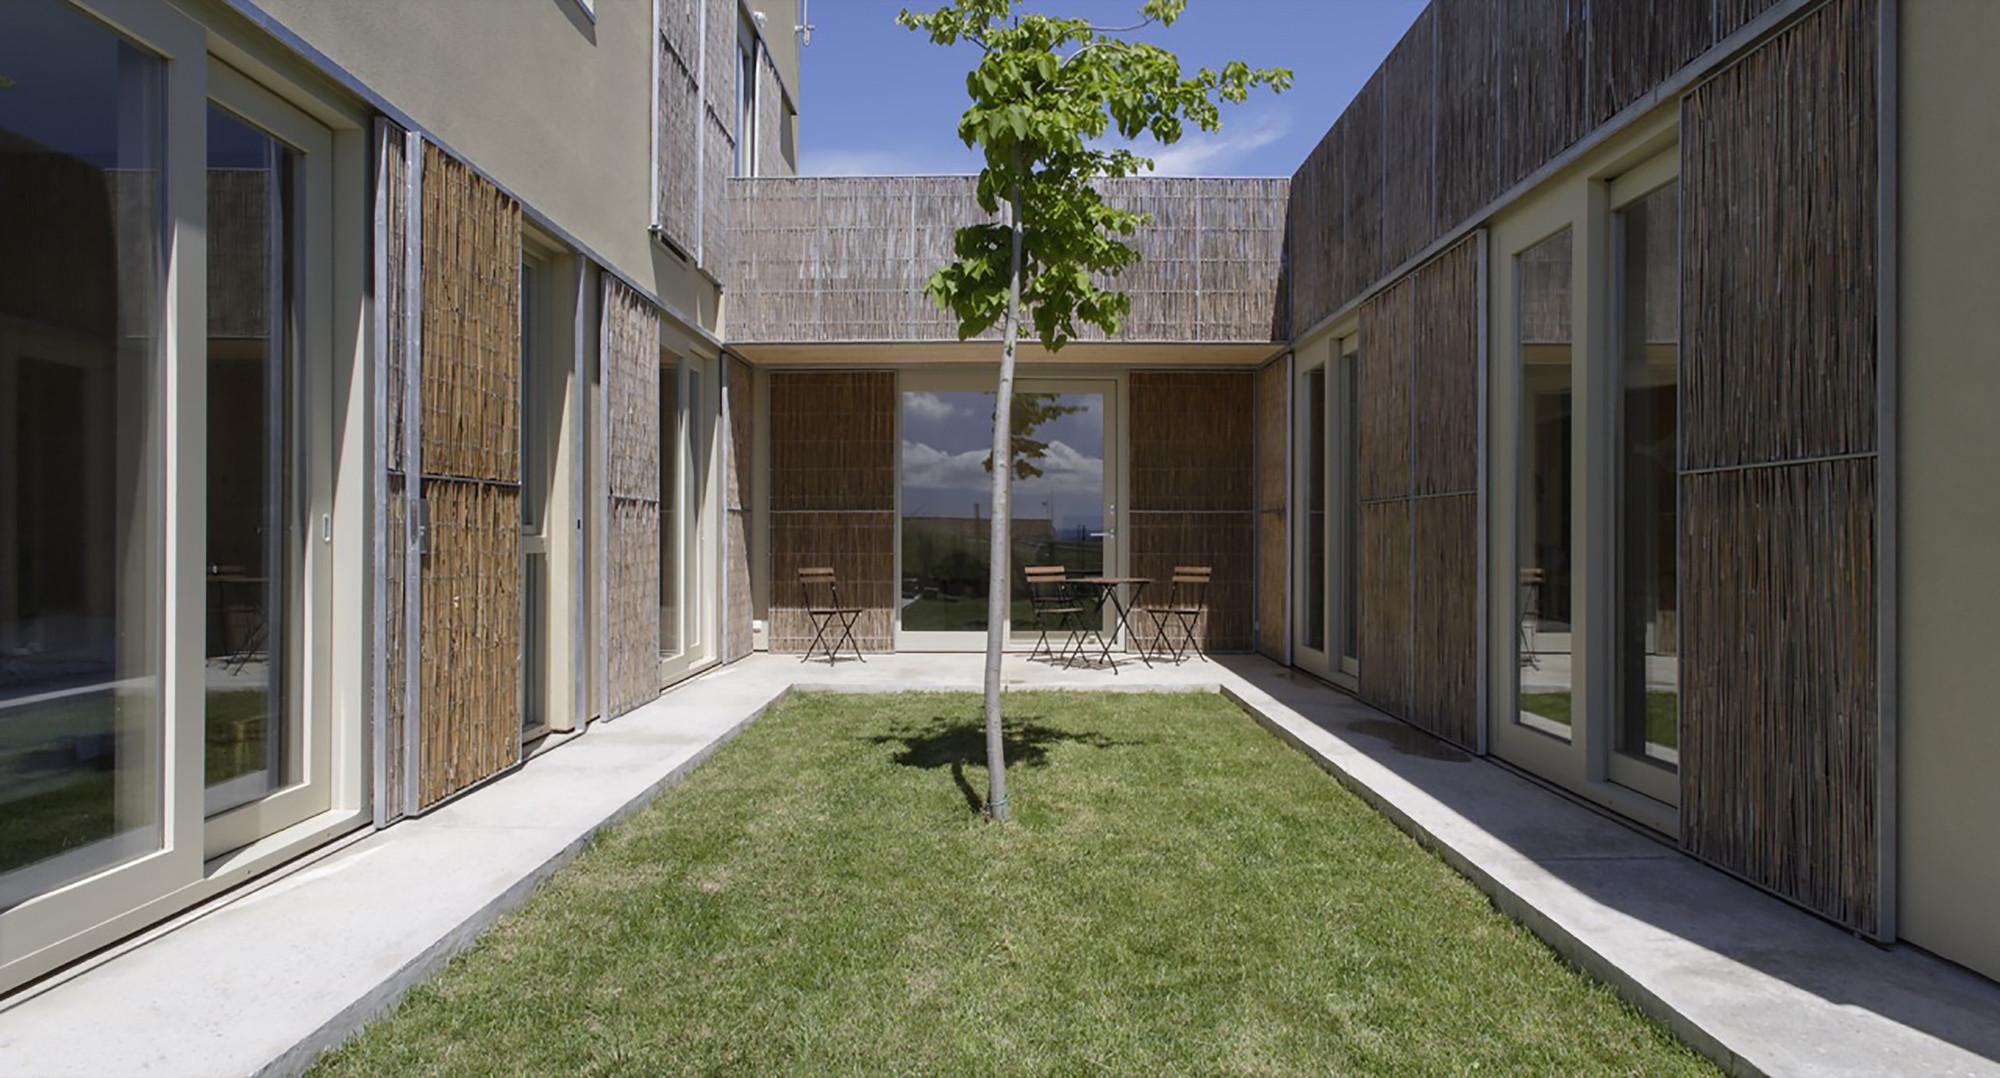 Residência b- Empordà /  B- Architecture, © Lourdes Jansana